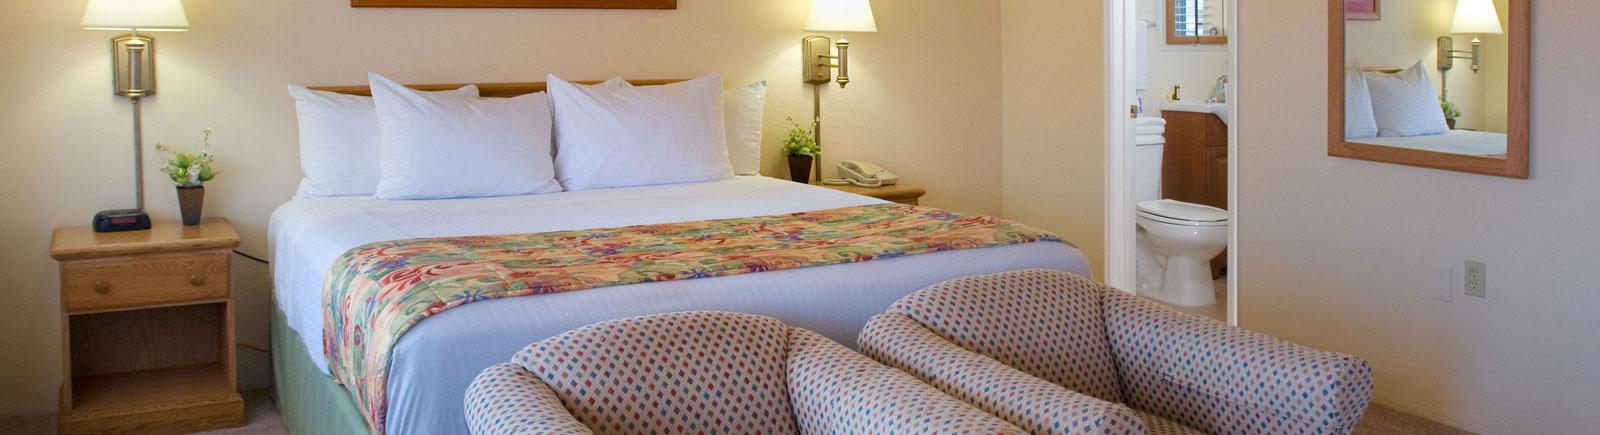 Rooms at Old Town Inn San Diego California